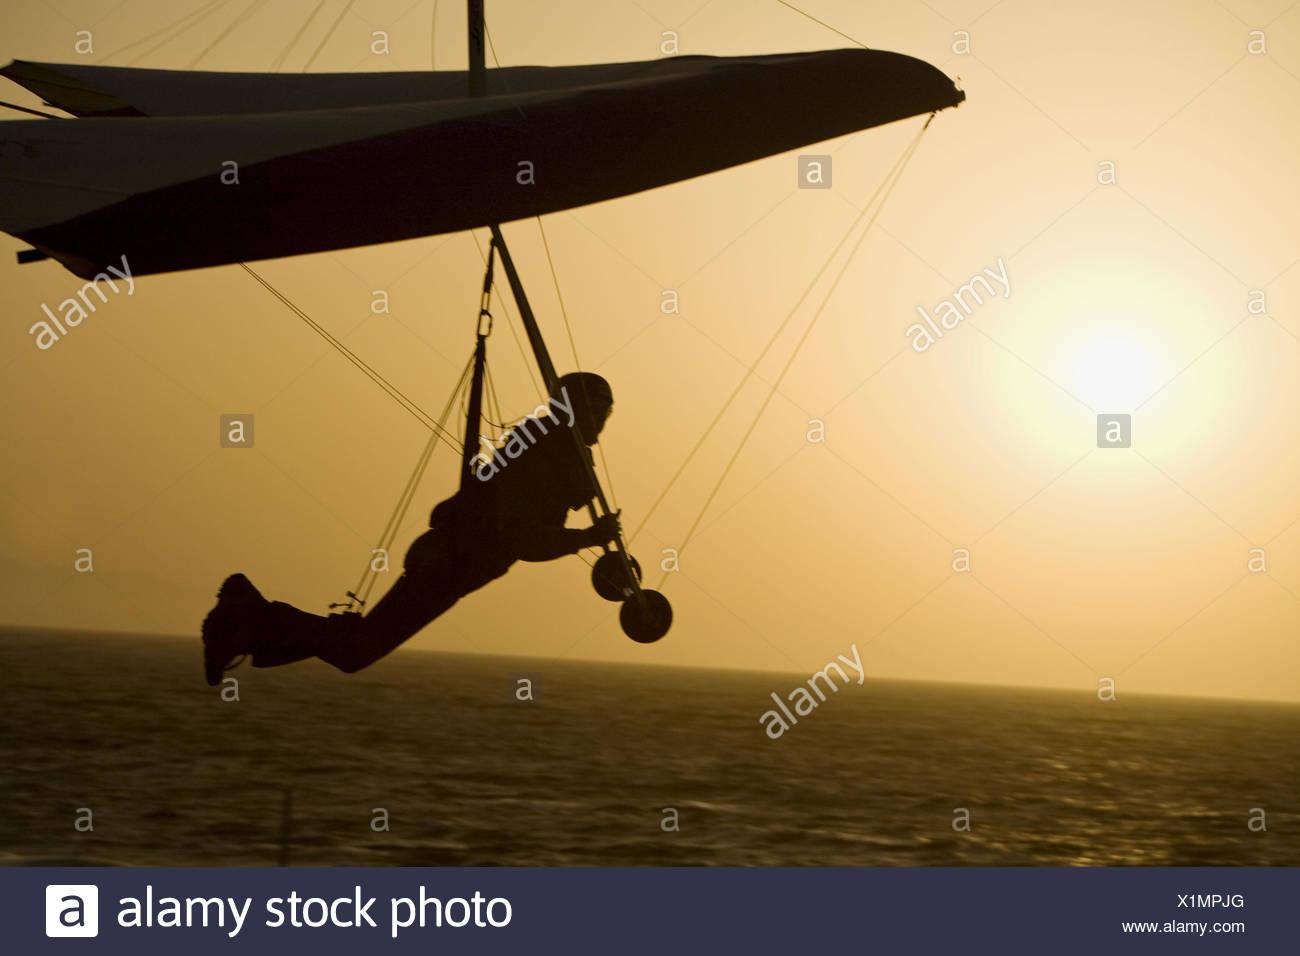 Man hand gliding, Playa del Rey, Los Angeles, California, USA Stock Photo